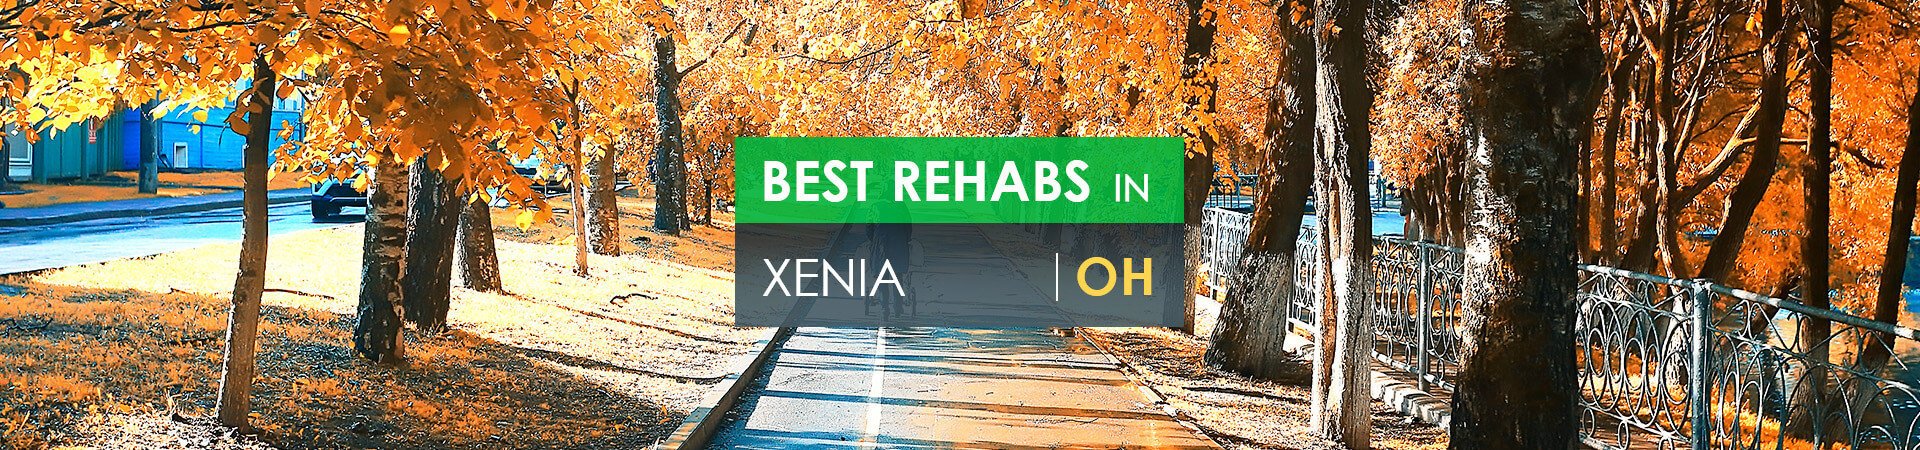 Best rehabs in Xenia, OH